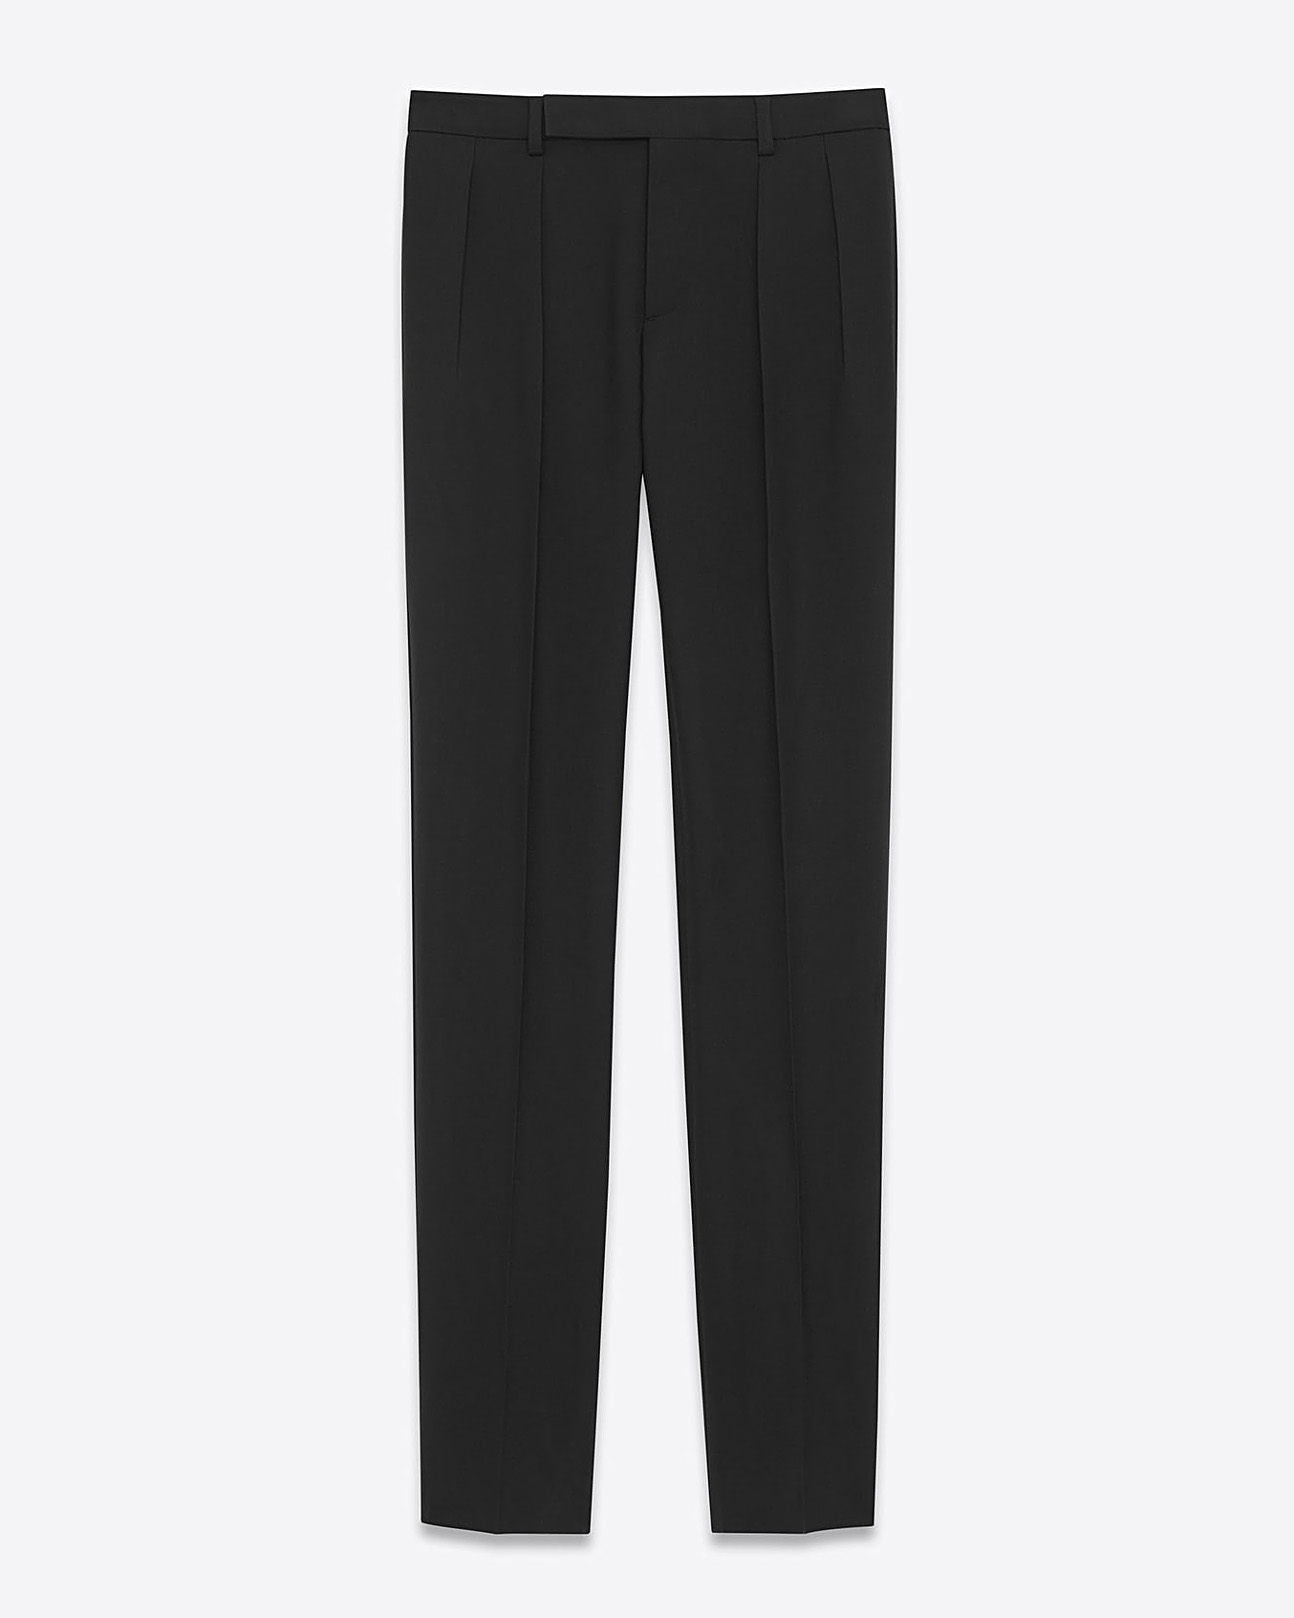 Saint Laurent Low Waisted Pleated Trouser In Black Gabardine